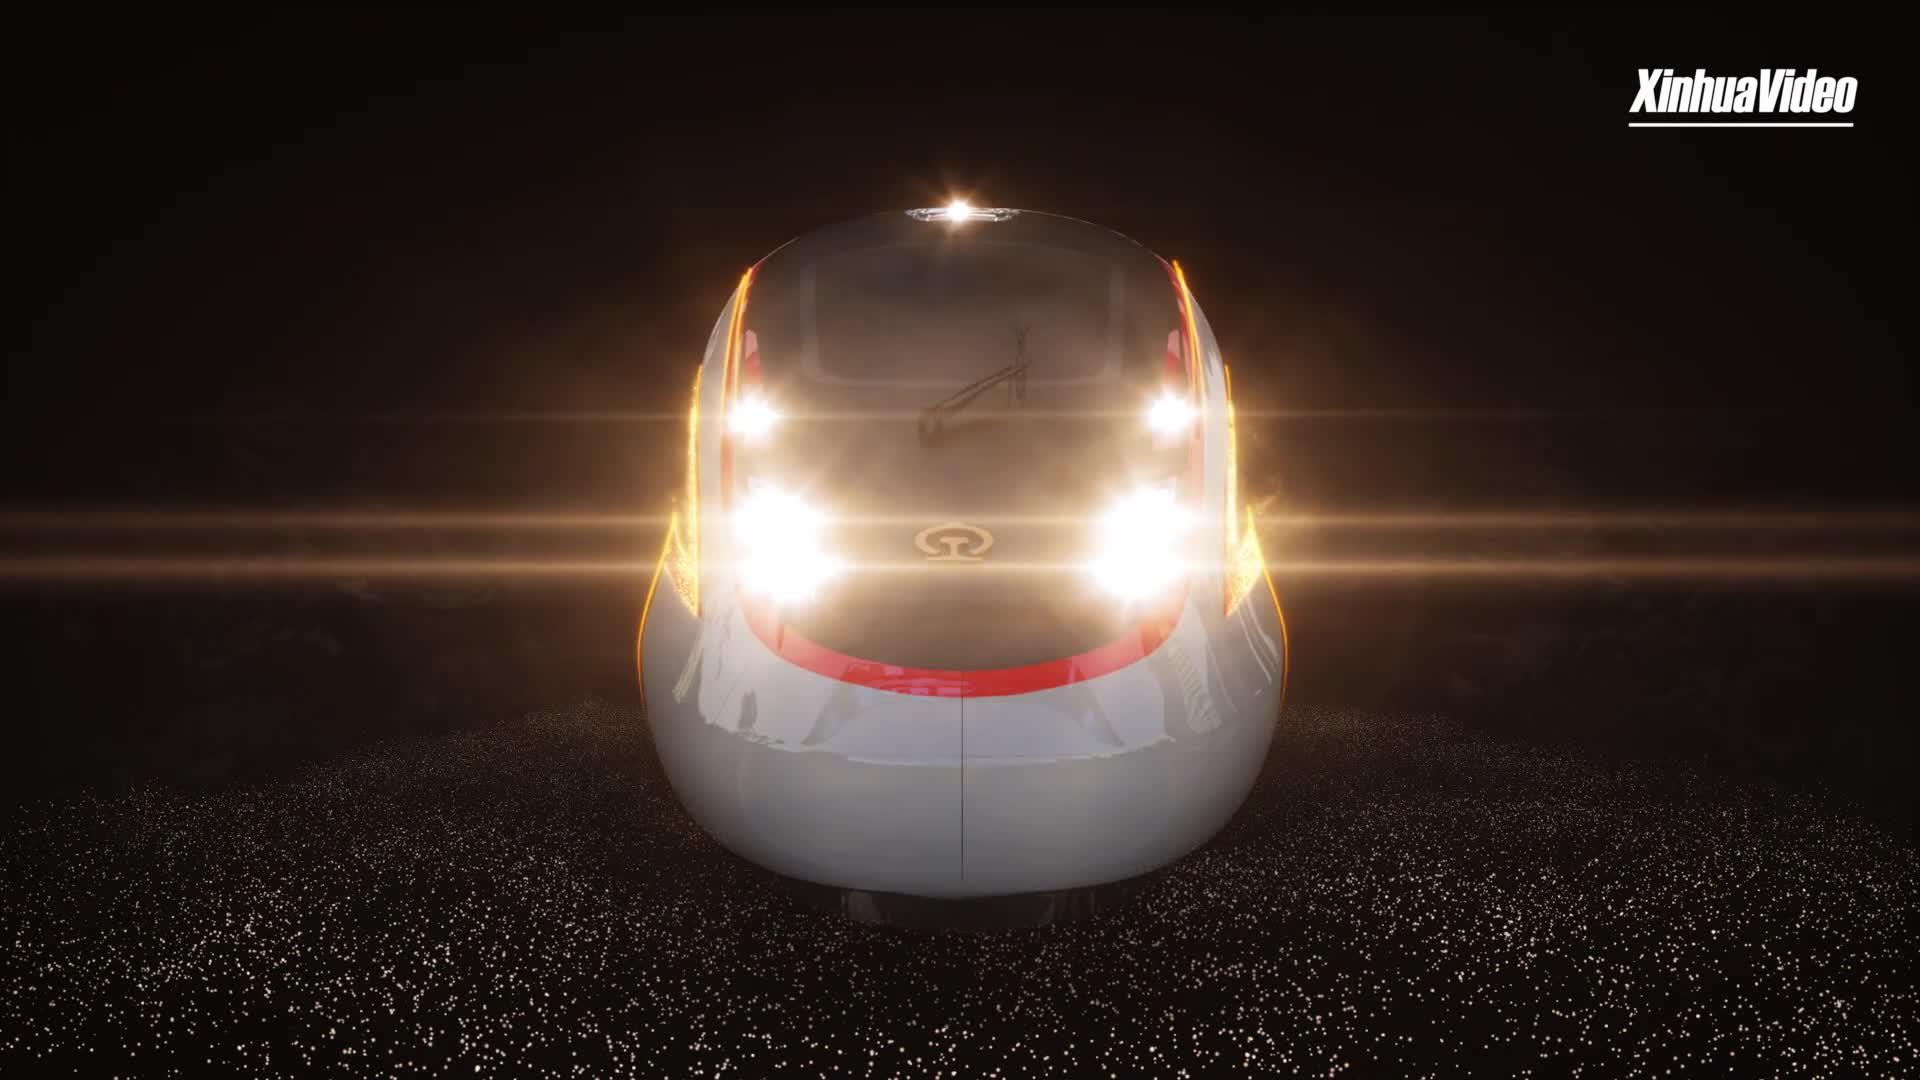 China's new high-speed train to bolster cross-border travel